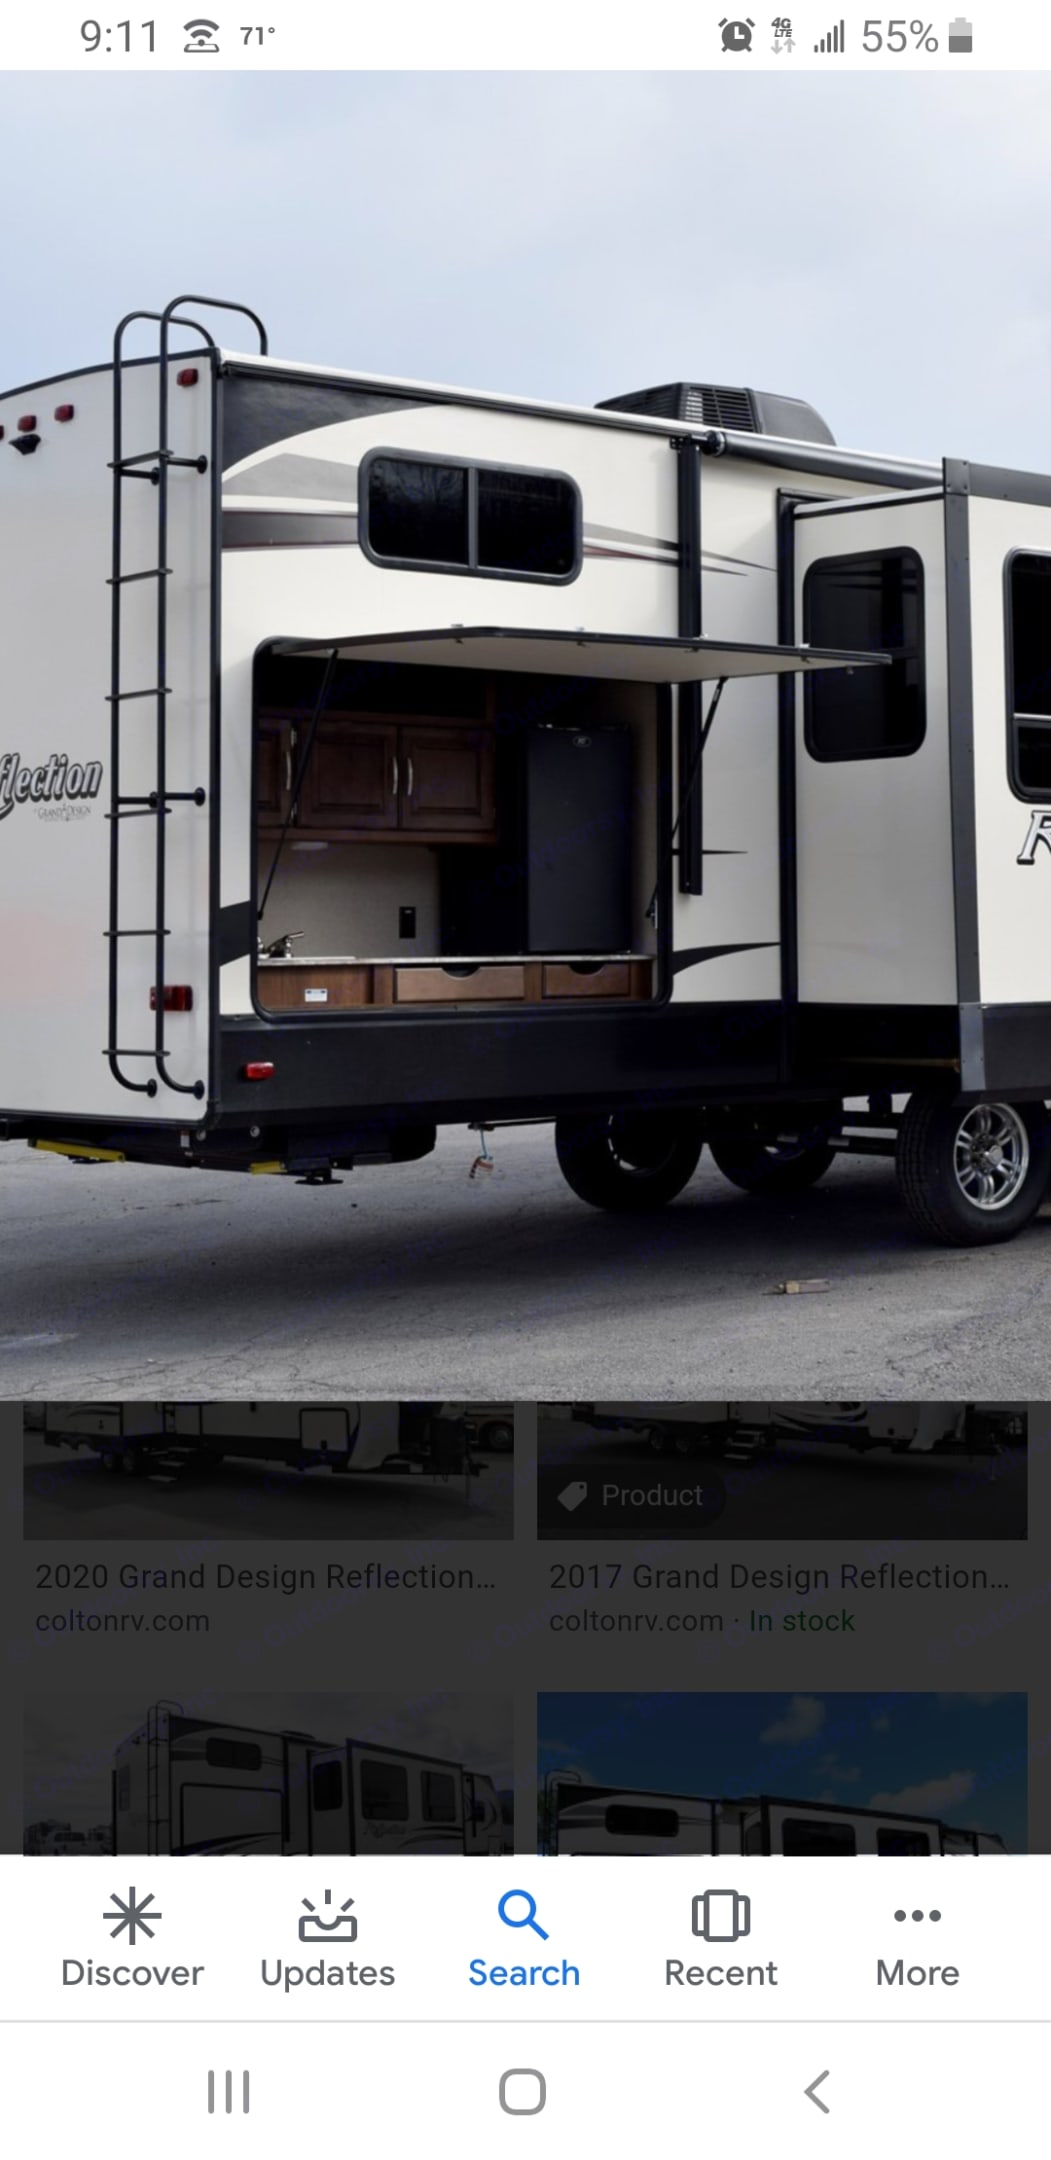 Outdoor kitchen with fridge. Grand Design Reflection 2019